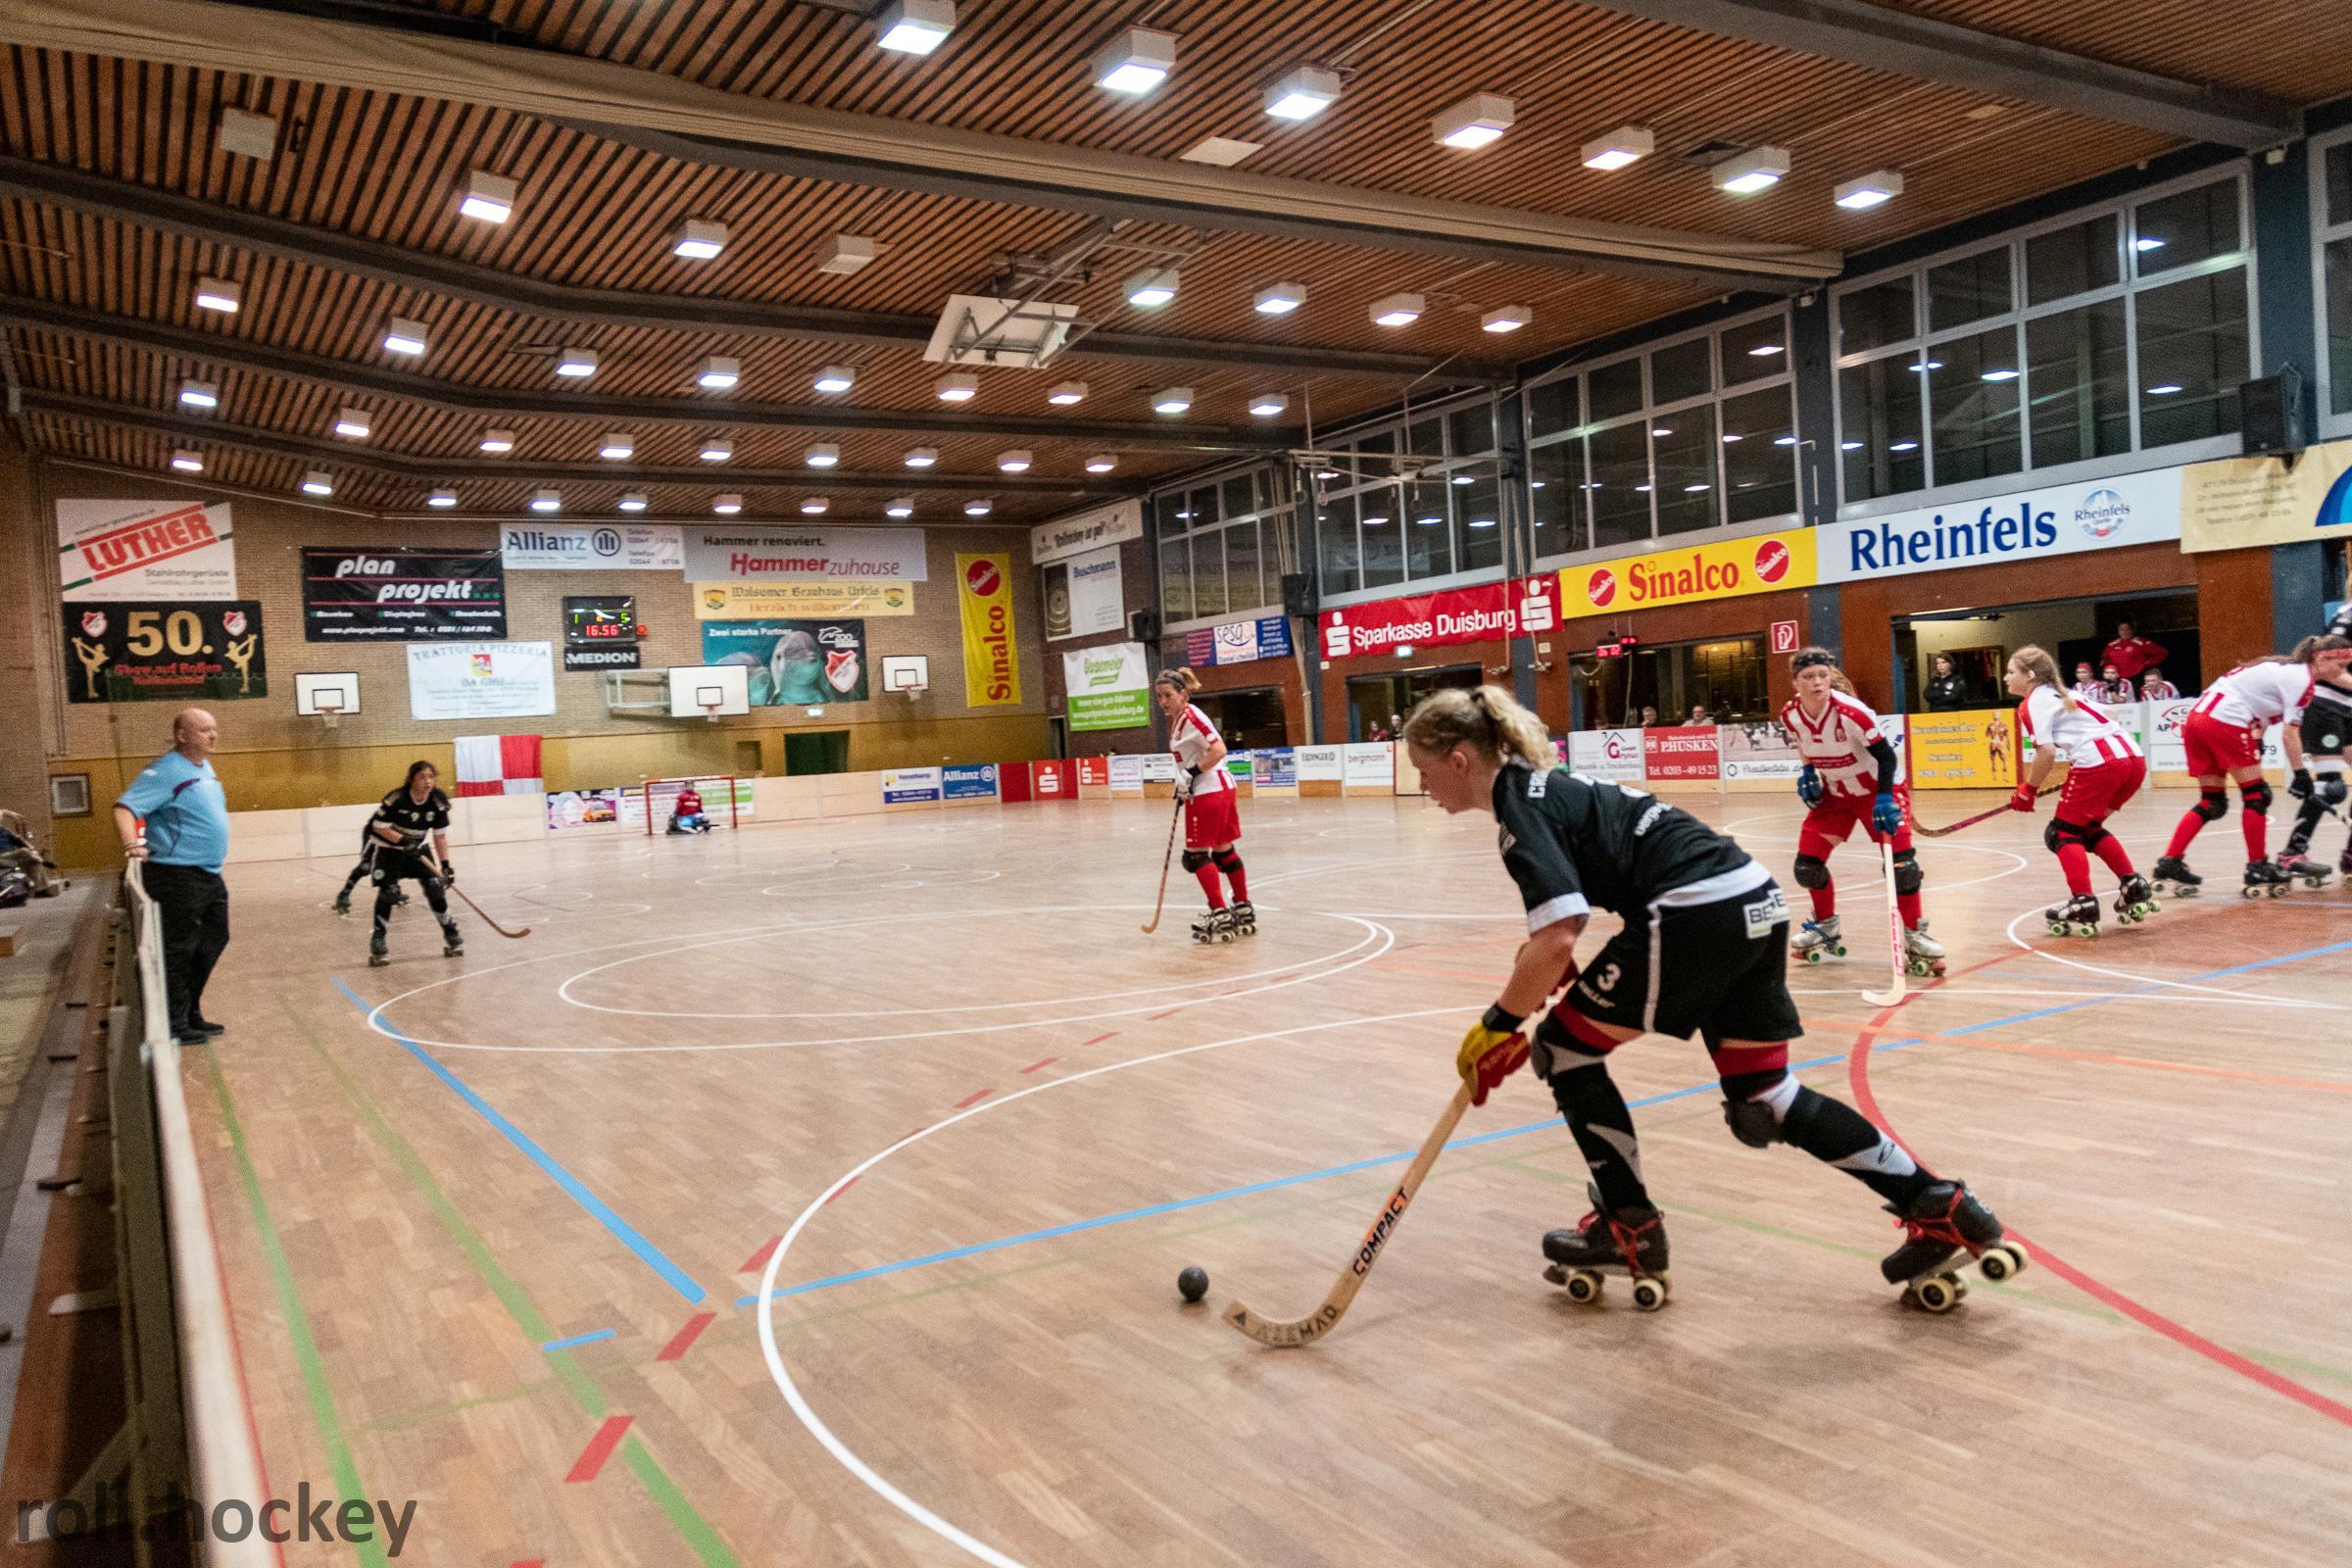 RSC Cronenberg Rollhockey Bundesliga Damen Spieltag 23.03.2019